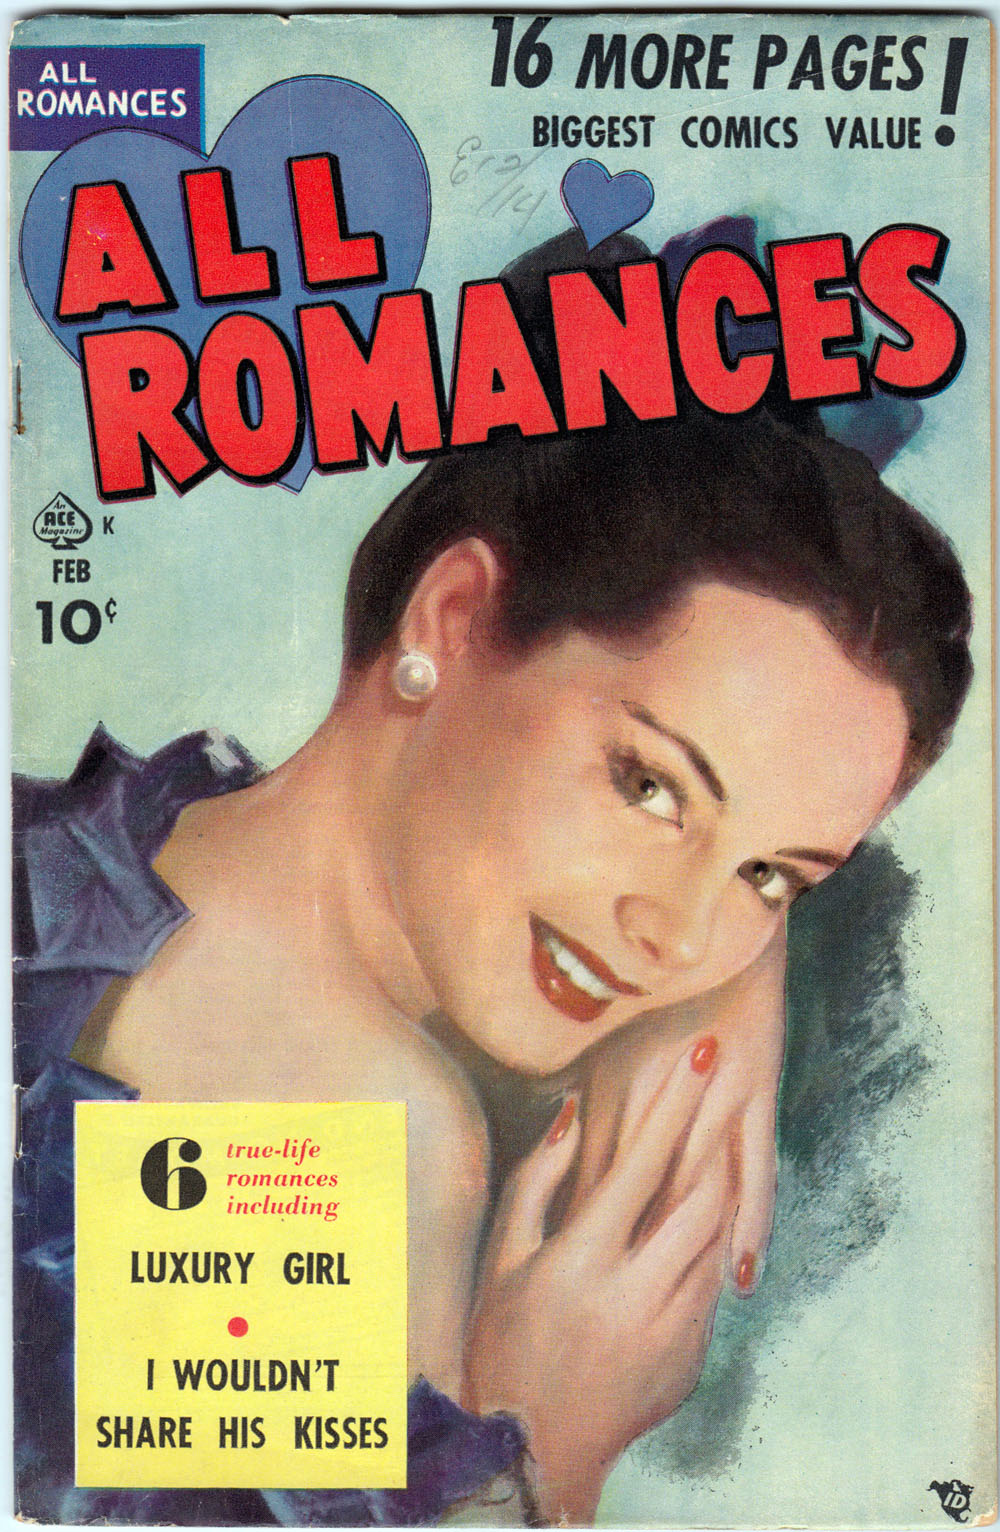 All Romances Vol 1 4